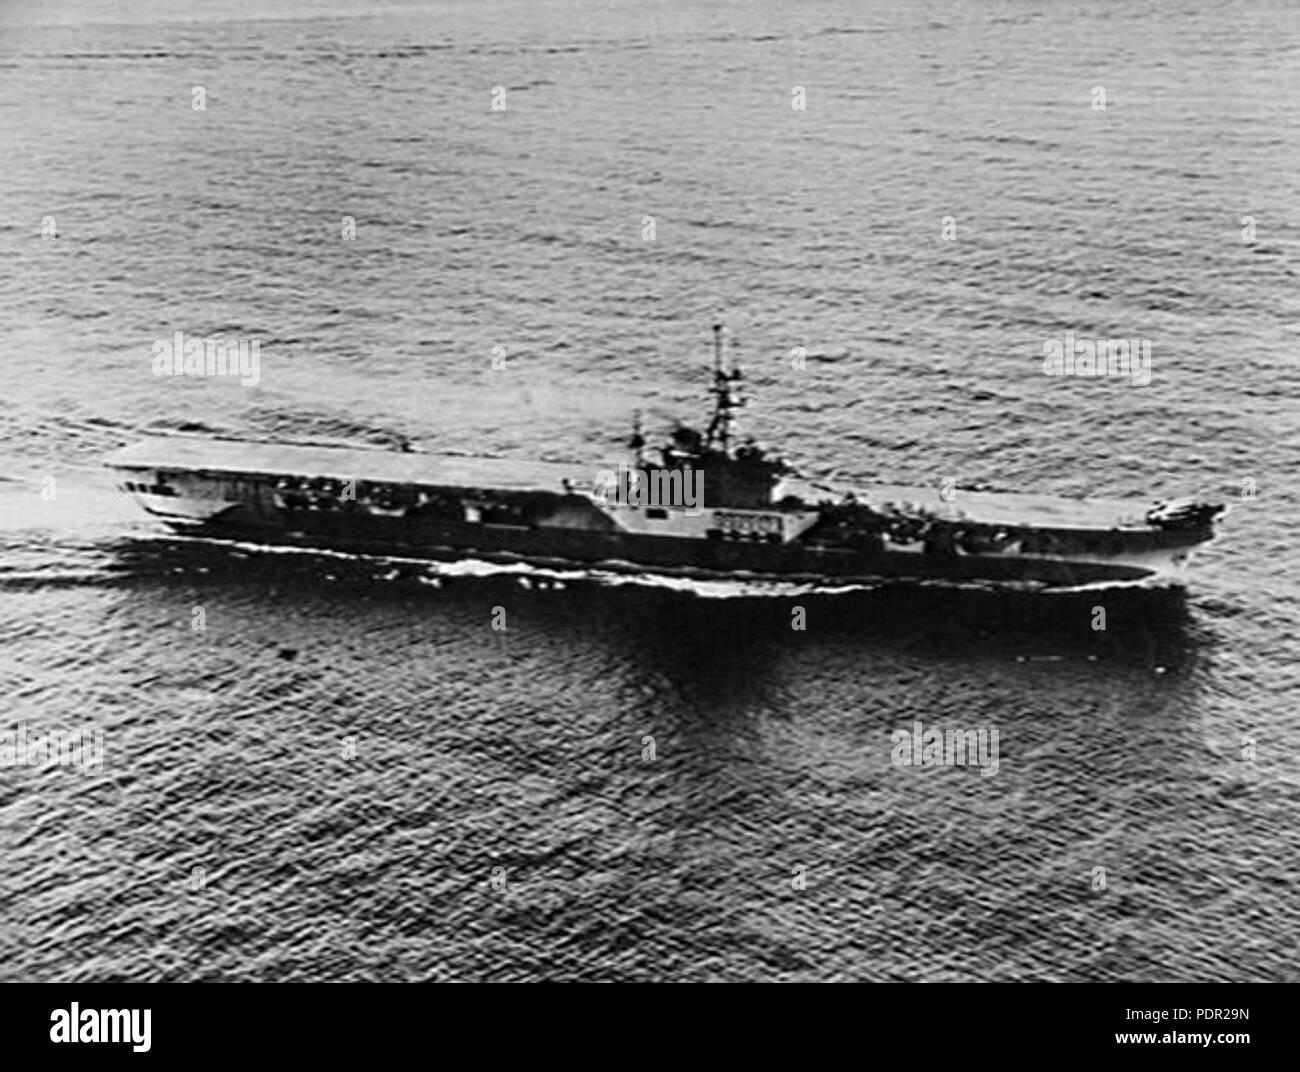 59 HMS Colossus (R15) aus Shanghai 1945 Stockbild